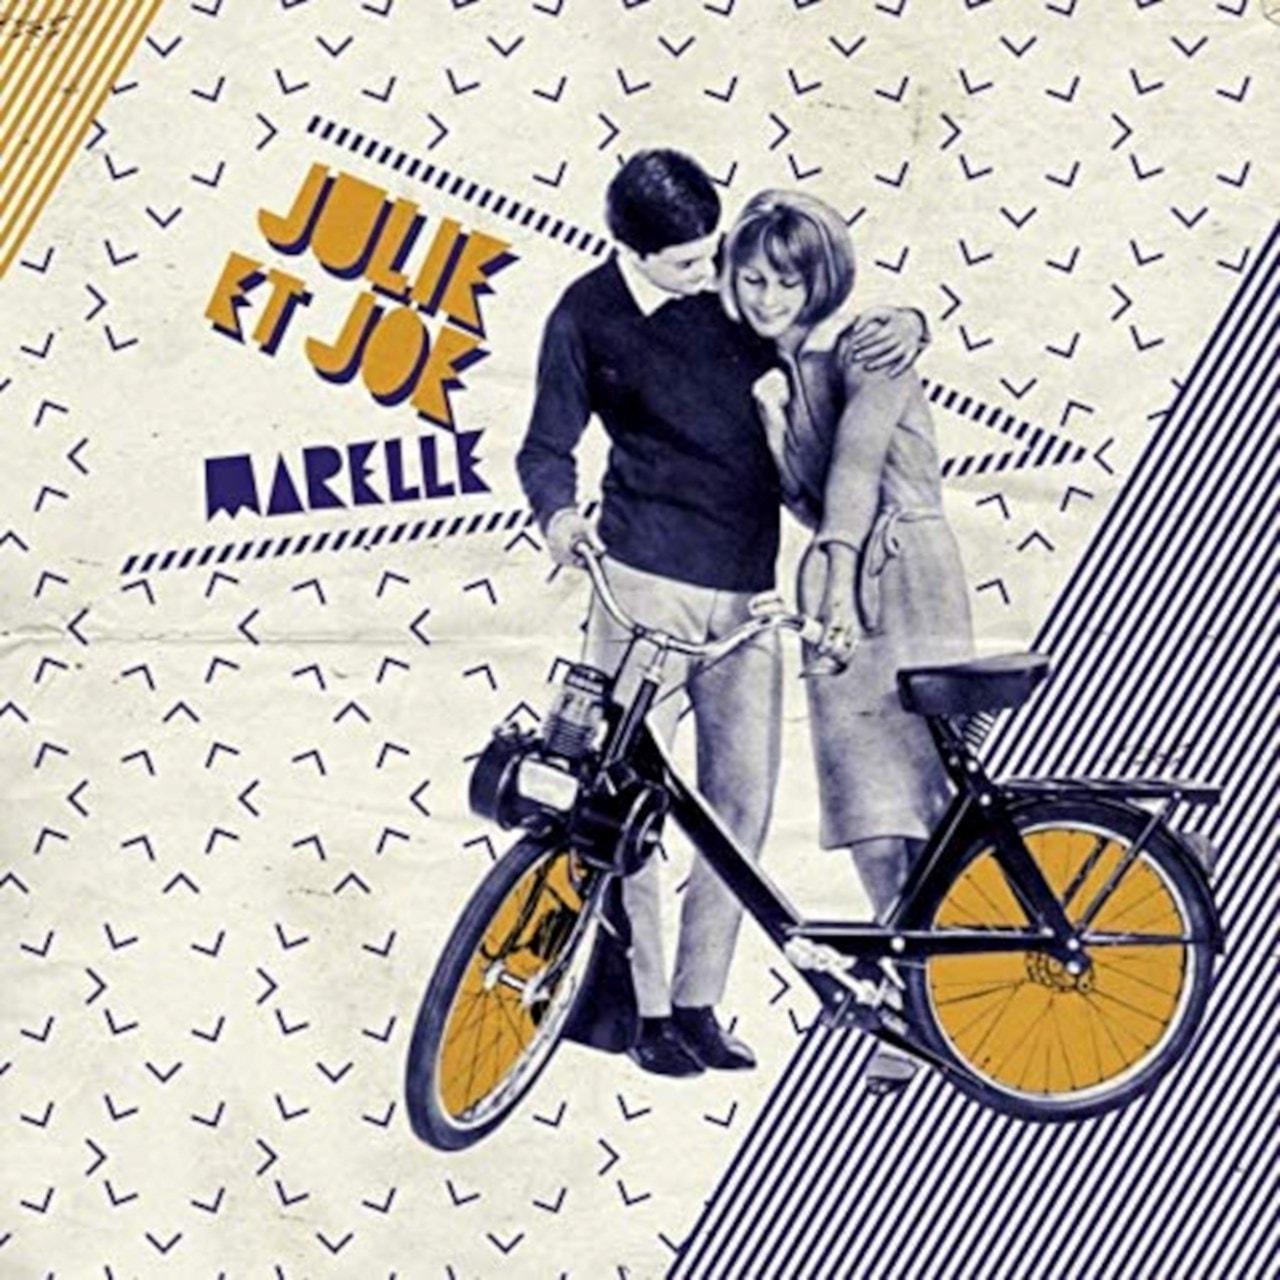 Marelle - 1